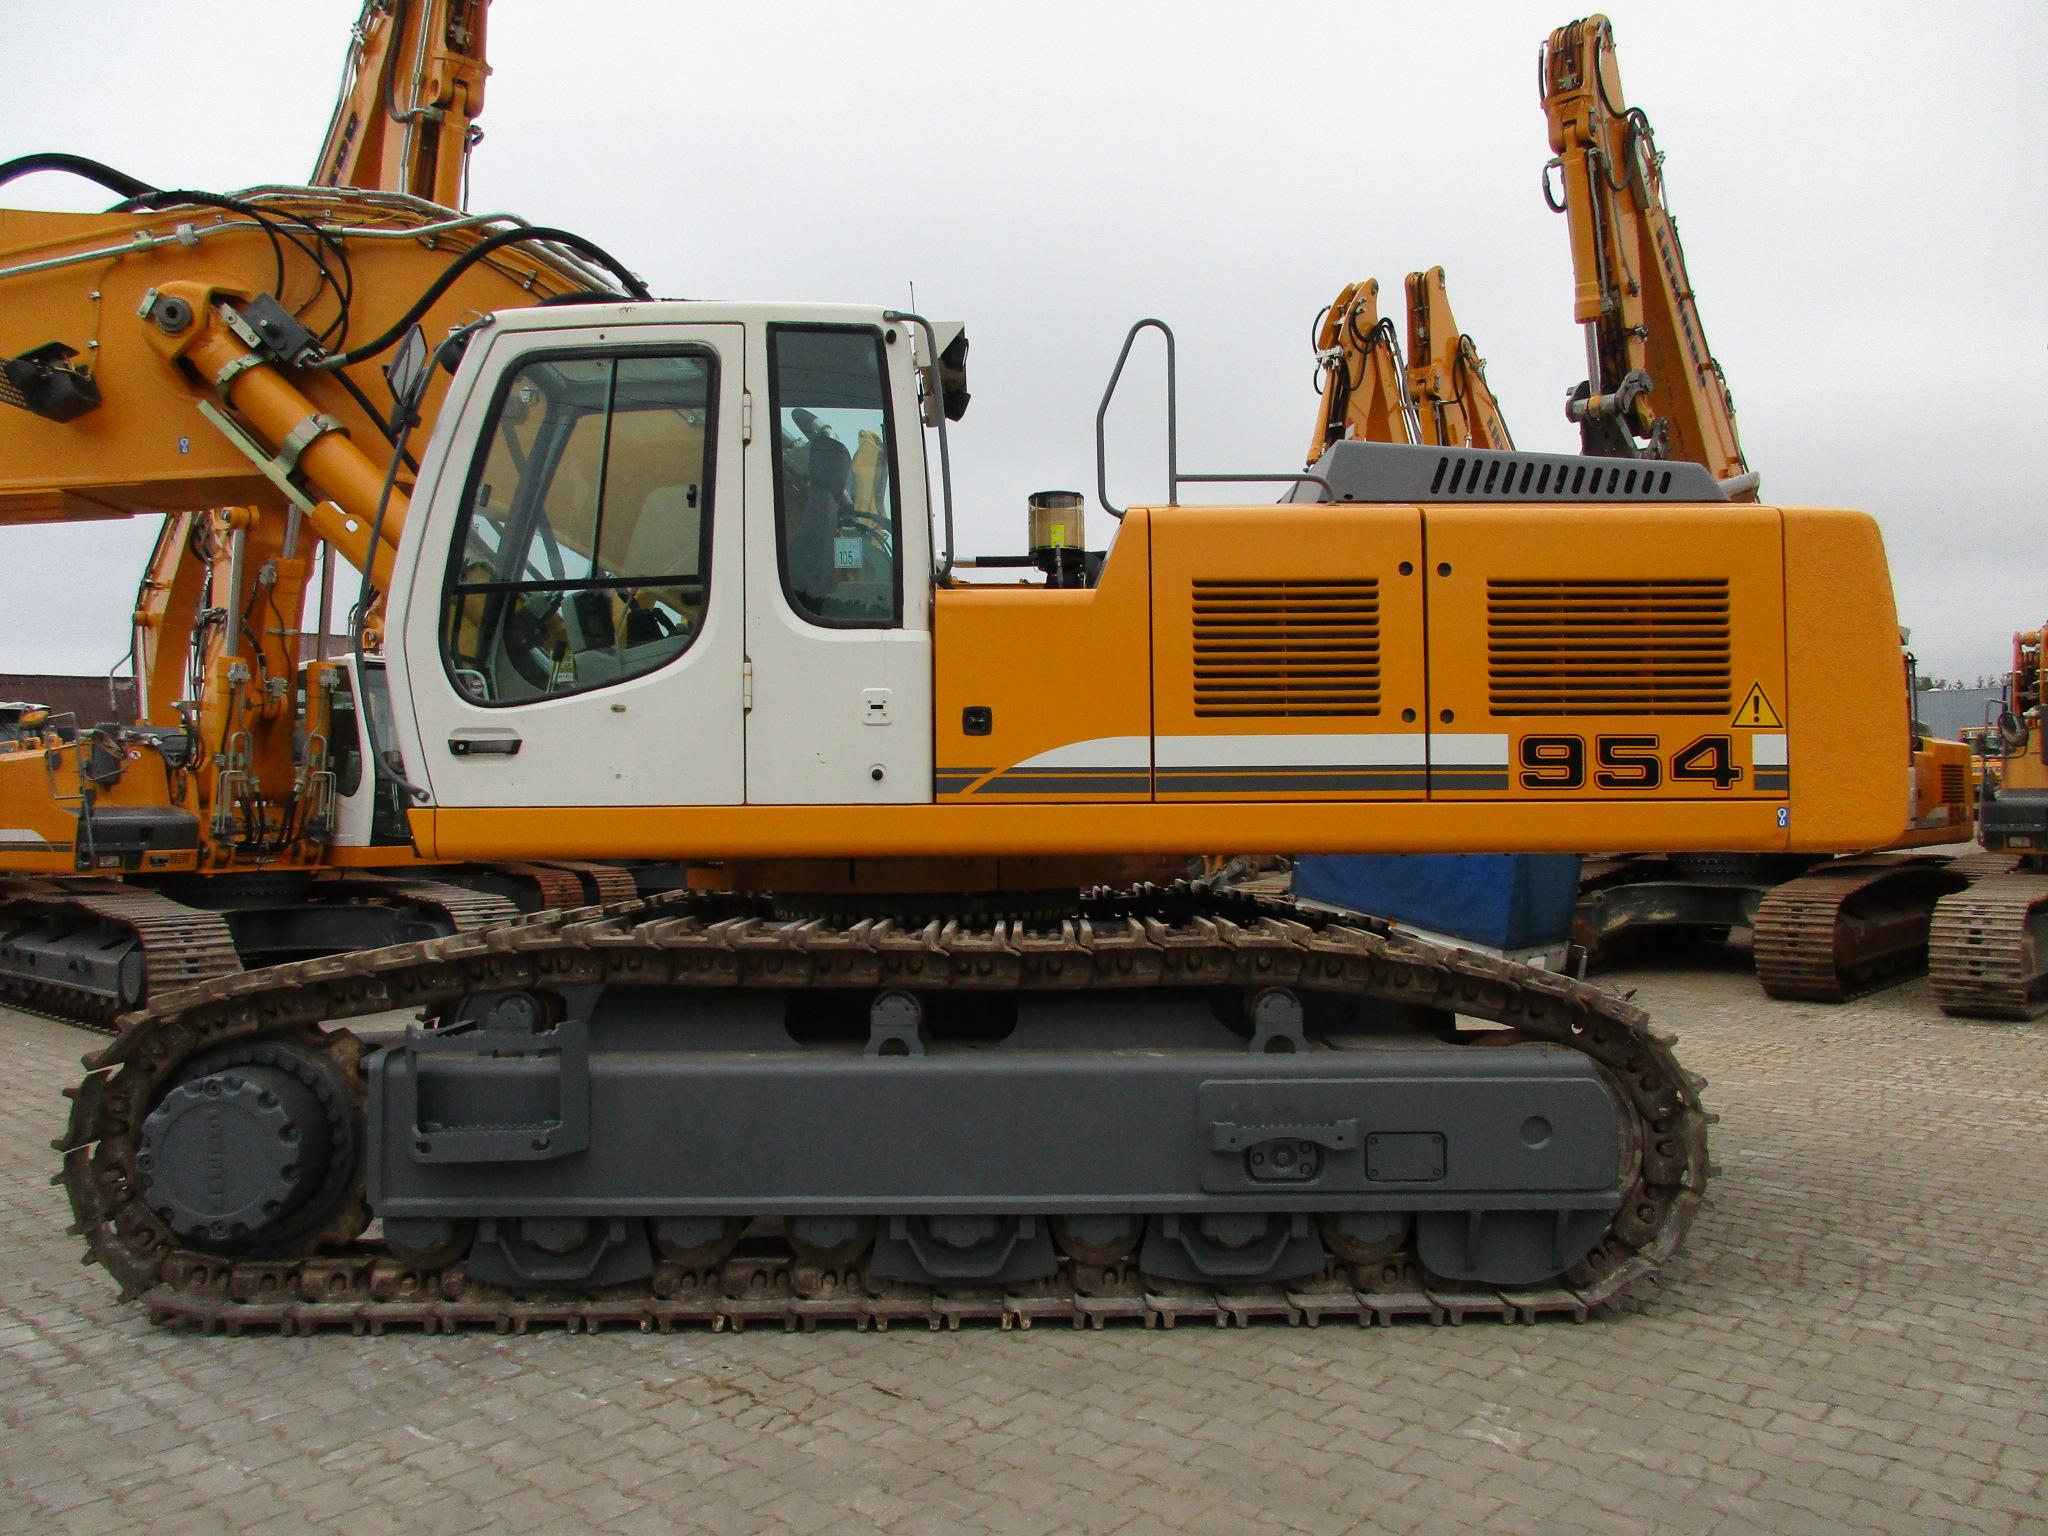 R 954C SHD LI -784-23630_001.JPG